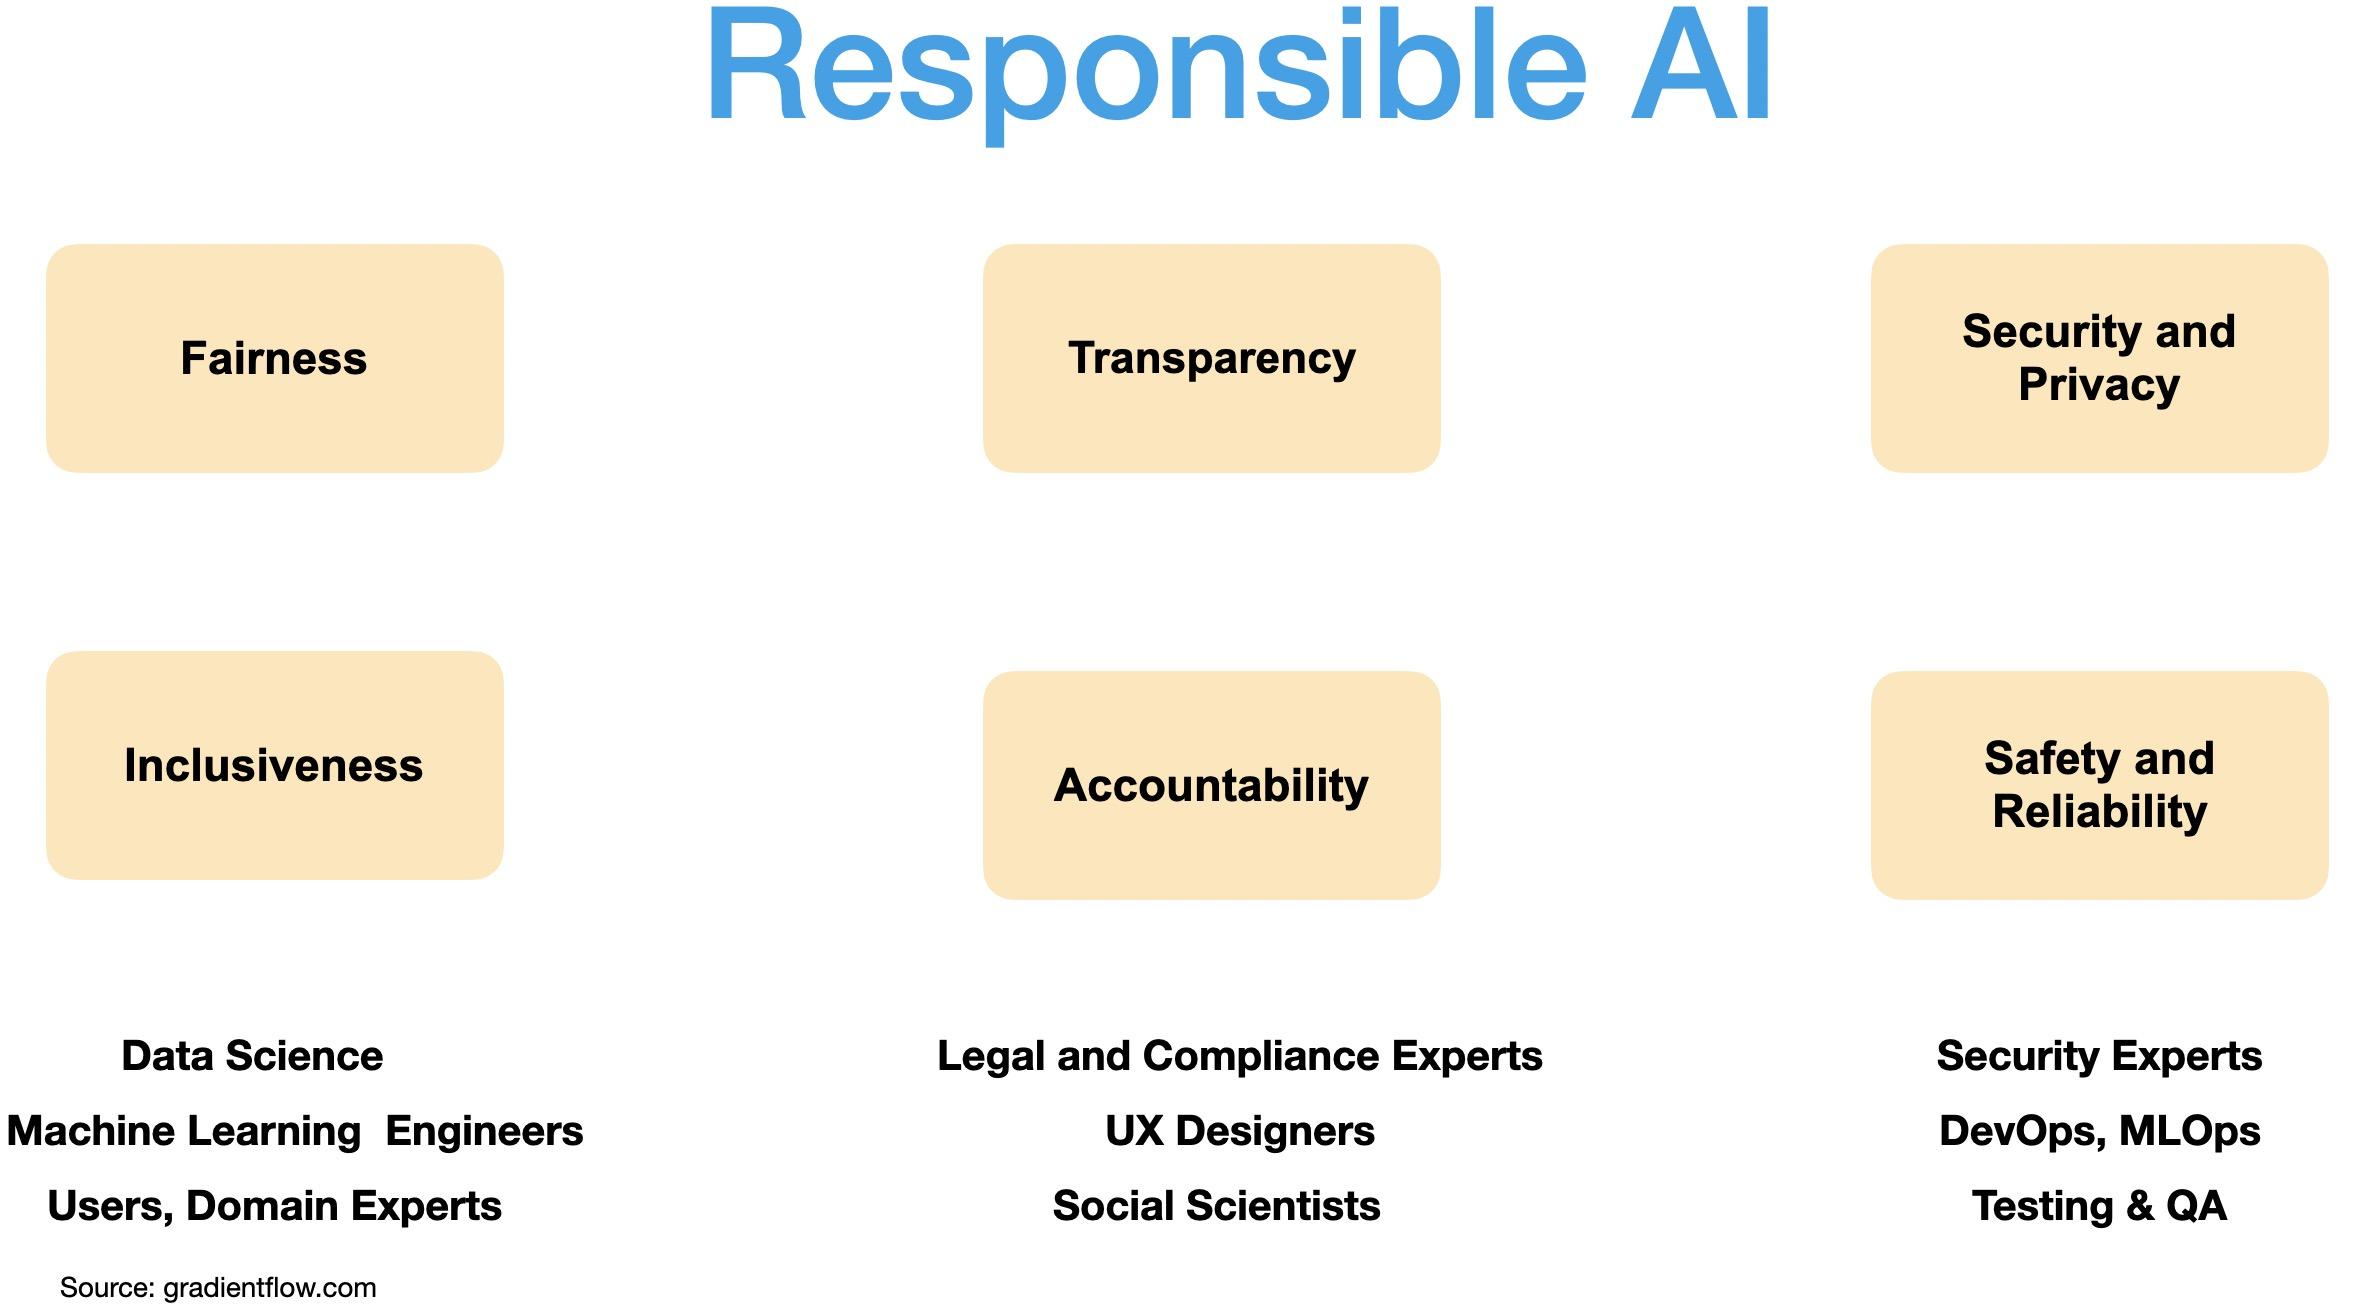 Responsible AI encompasses several areas